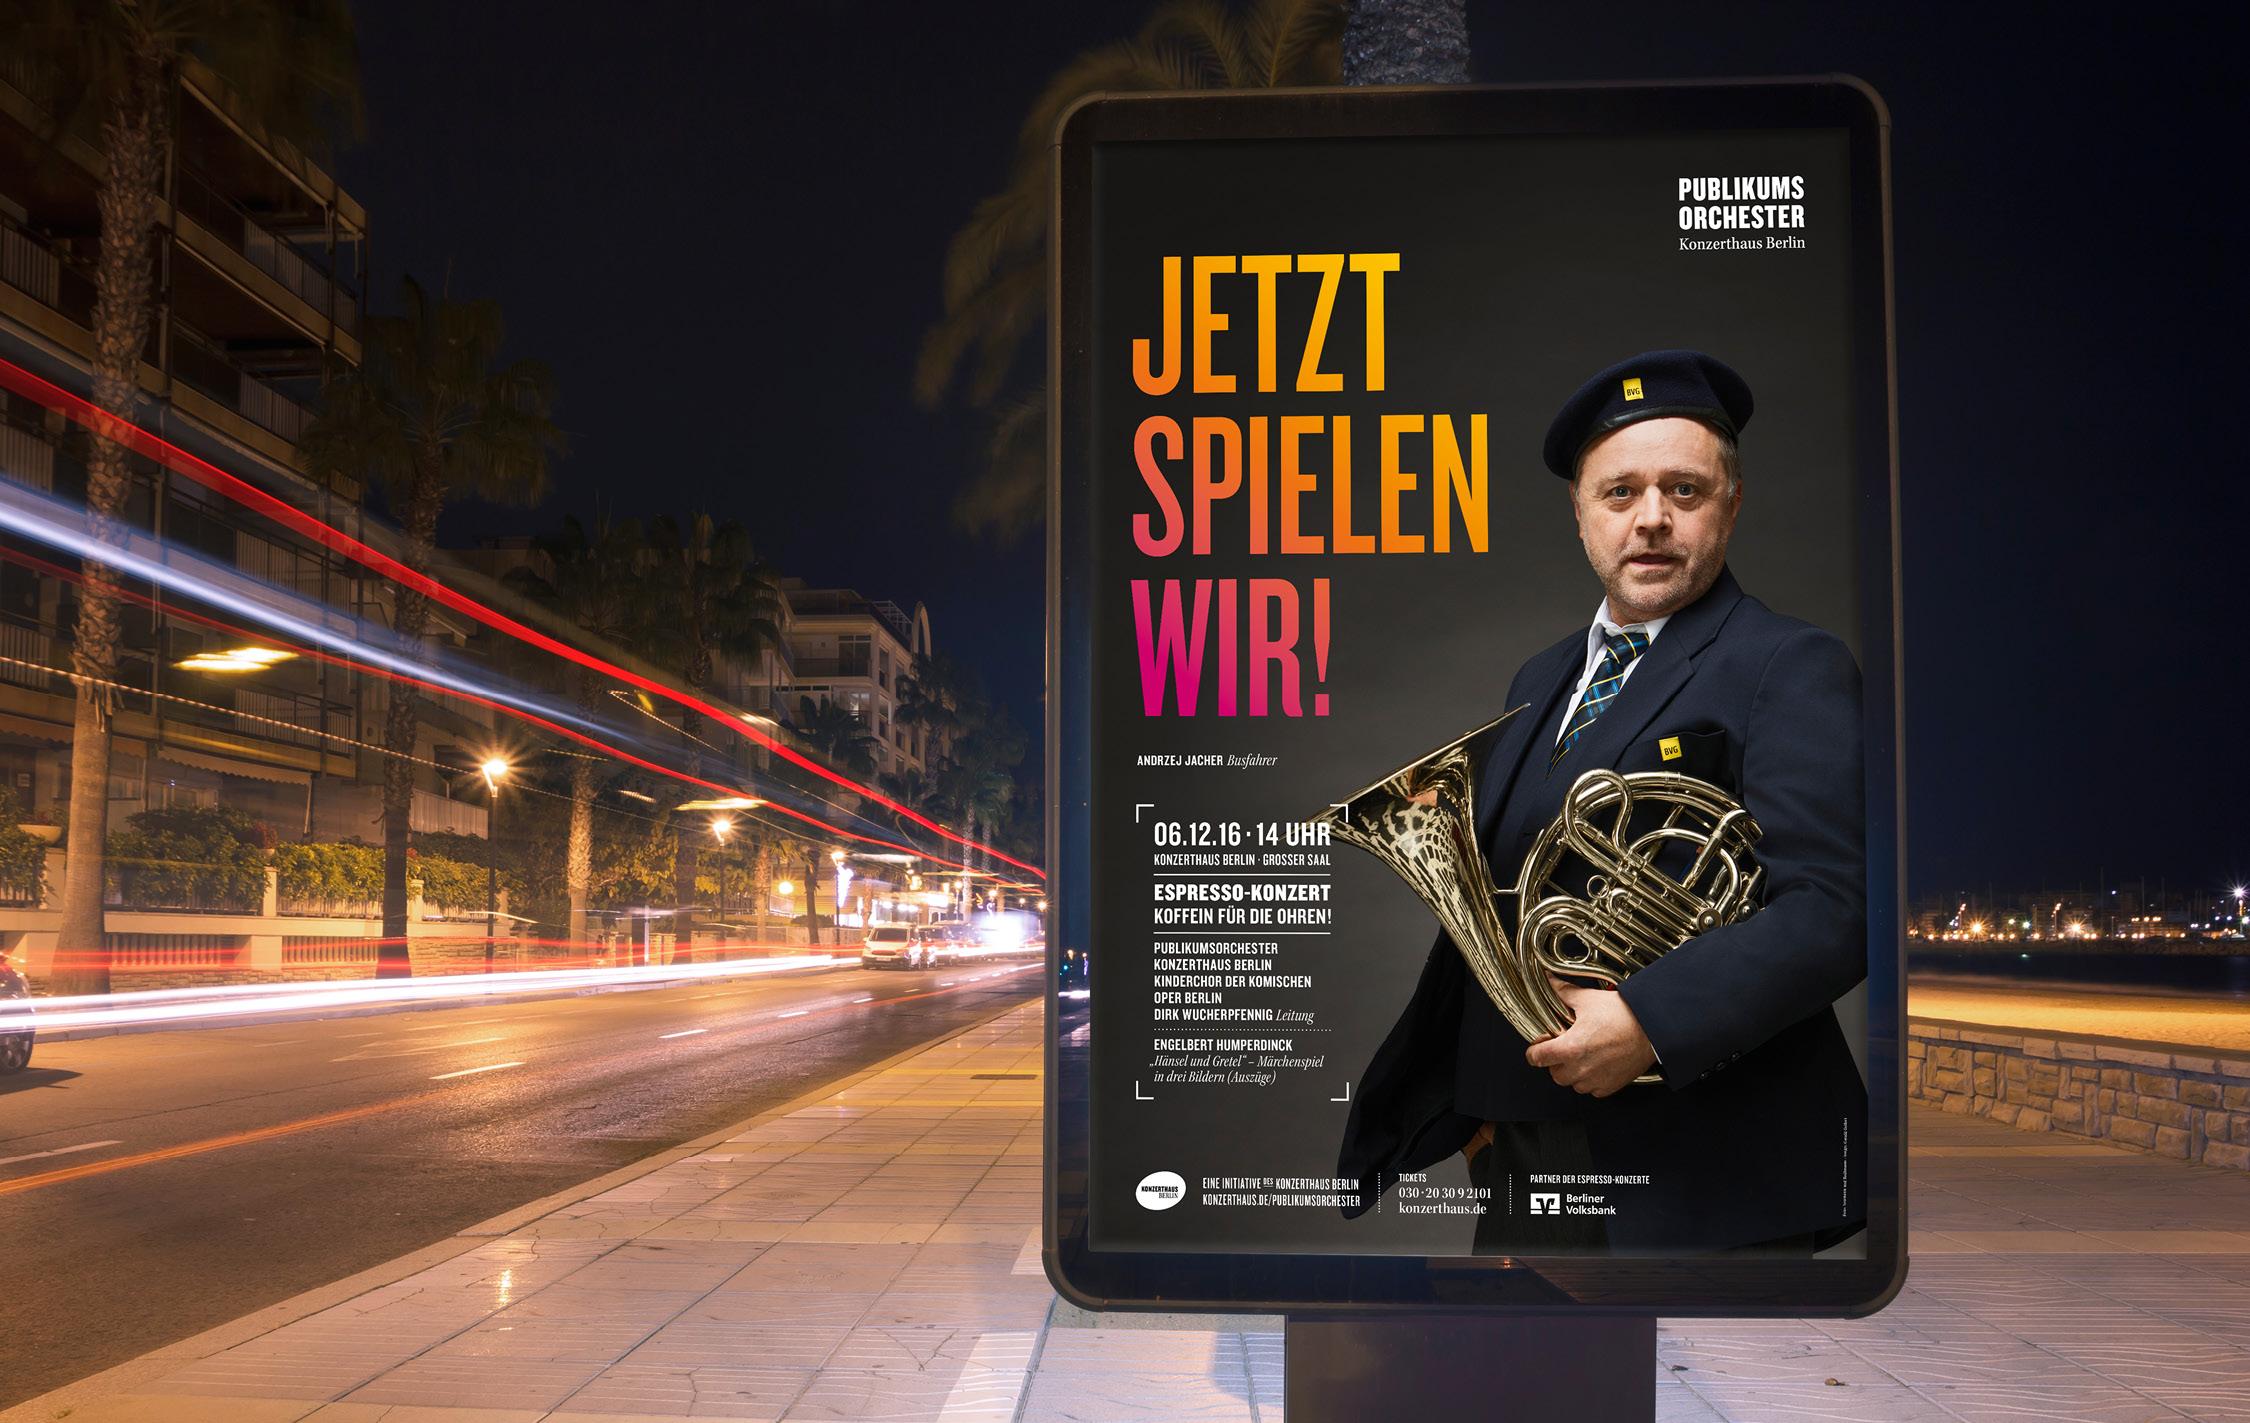 Konzerthaus Berlin Publikumsorchester Displaywerbung